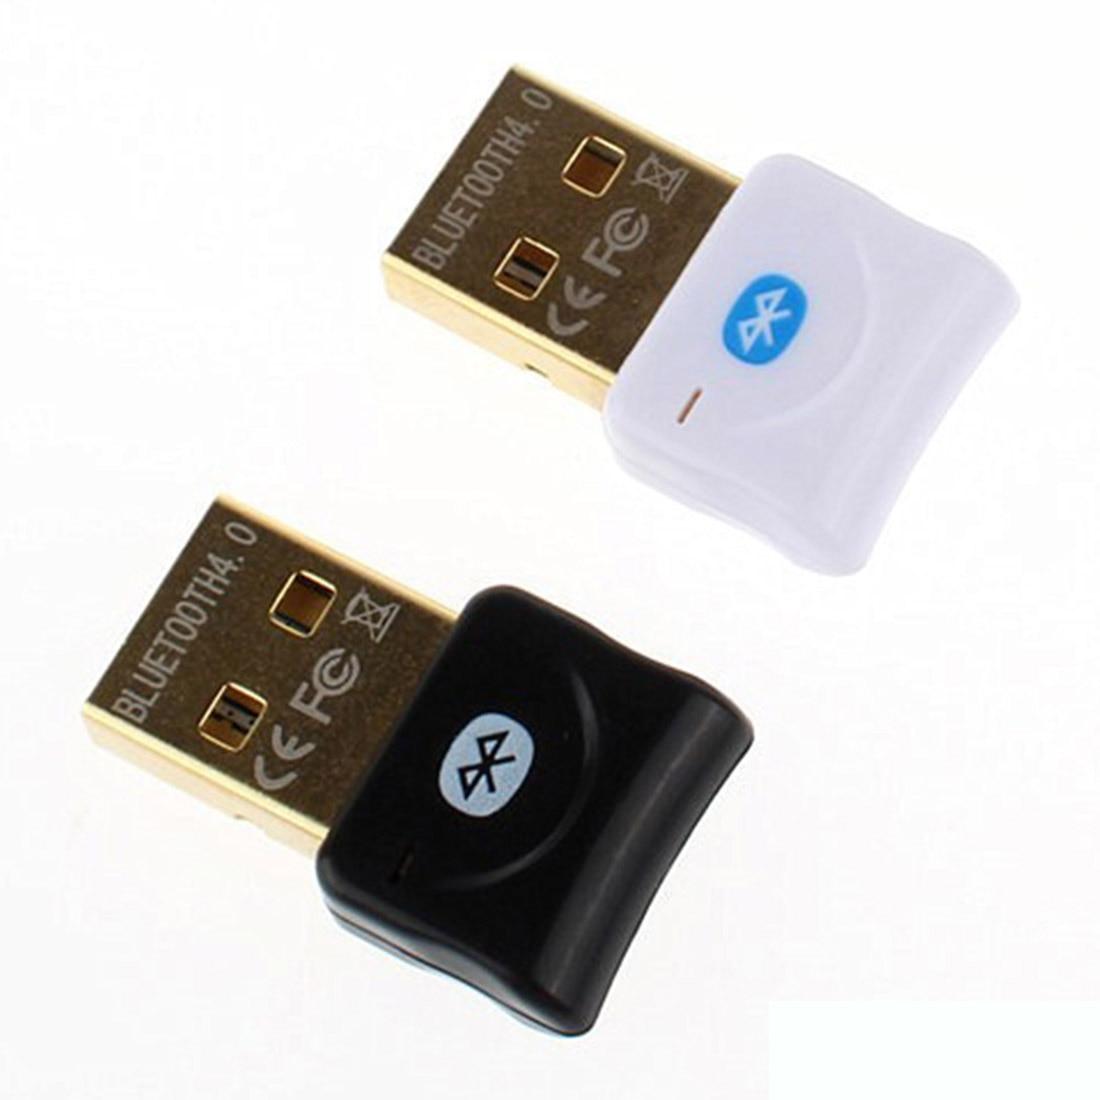 NOYOKERE Bluetooth brezžični USB adapter V4.0 Bluetooth Dongle Glasbeni sprejemnik zvoka Adaptador Bluetoo